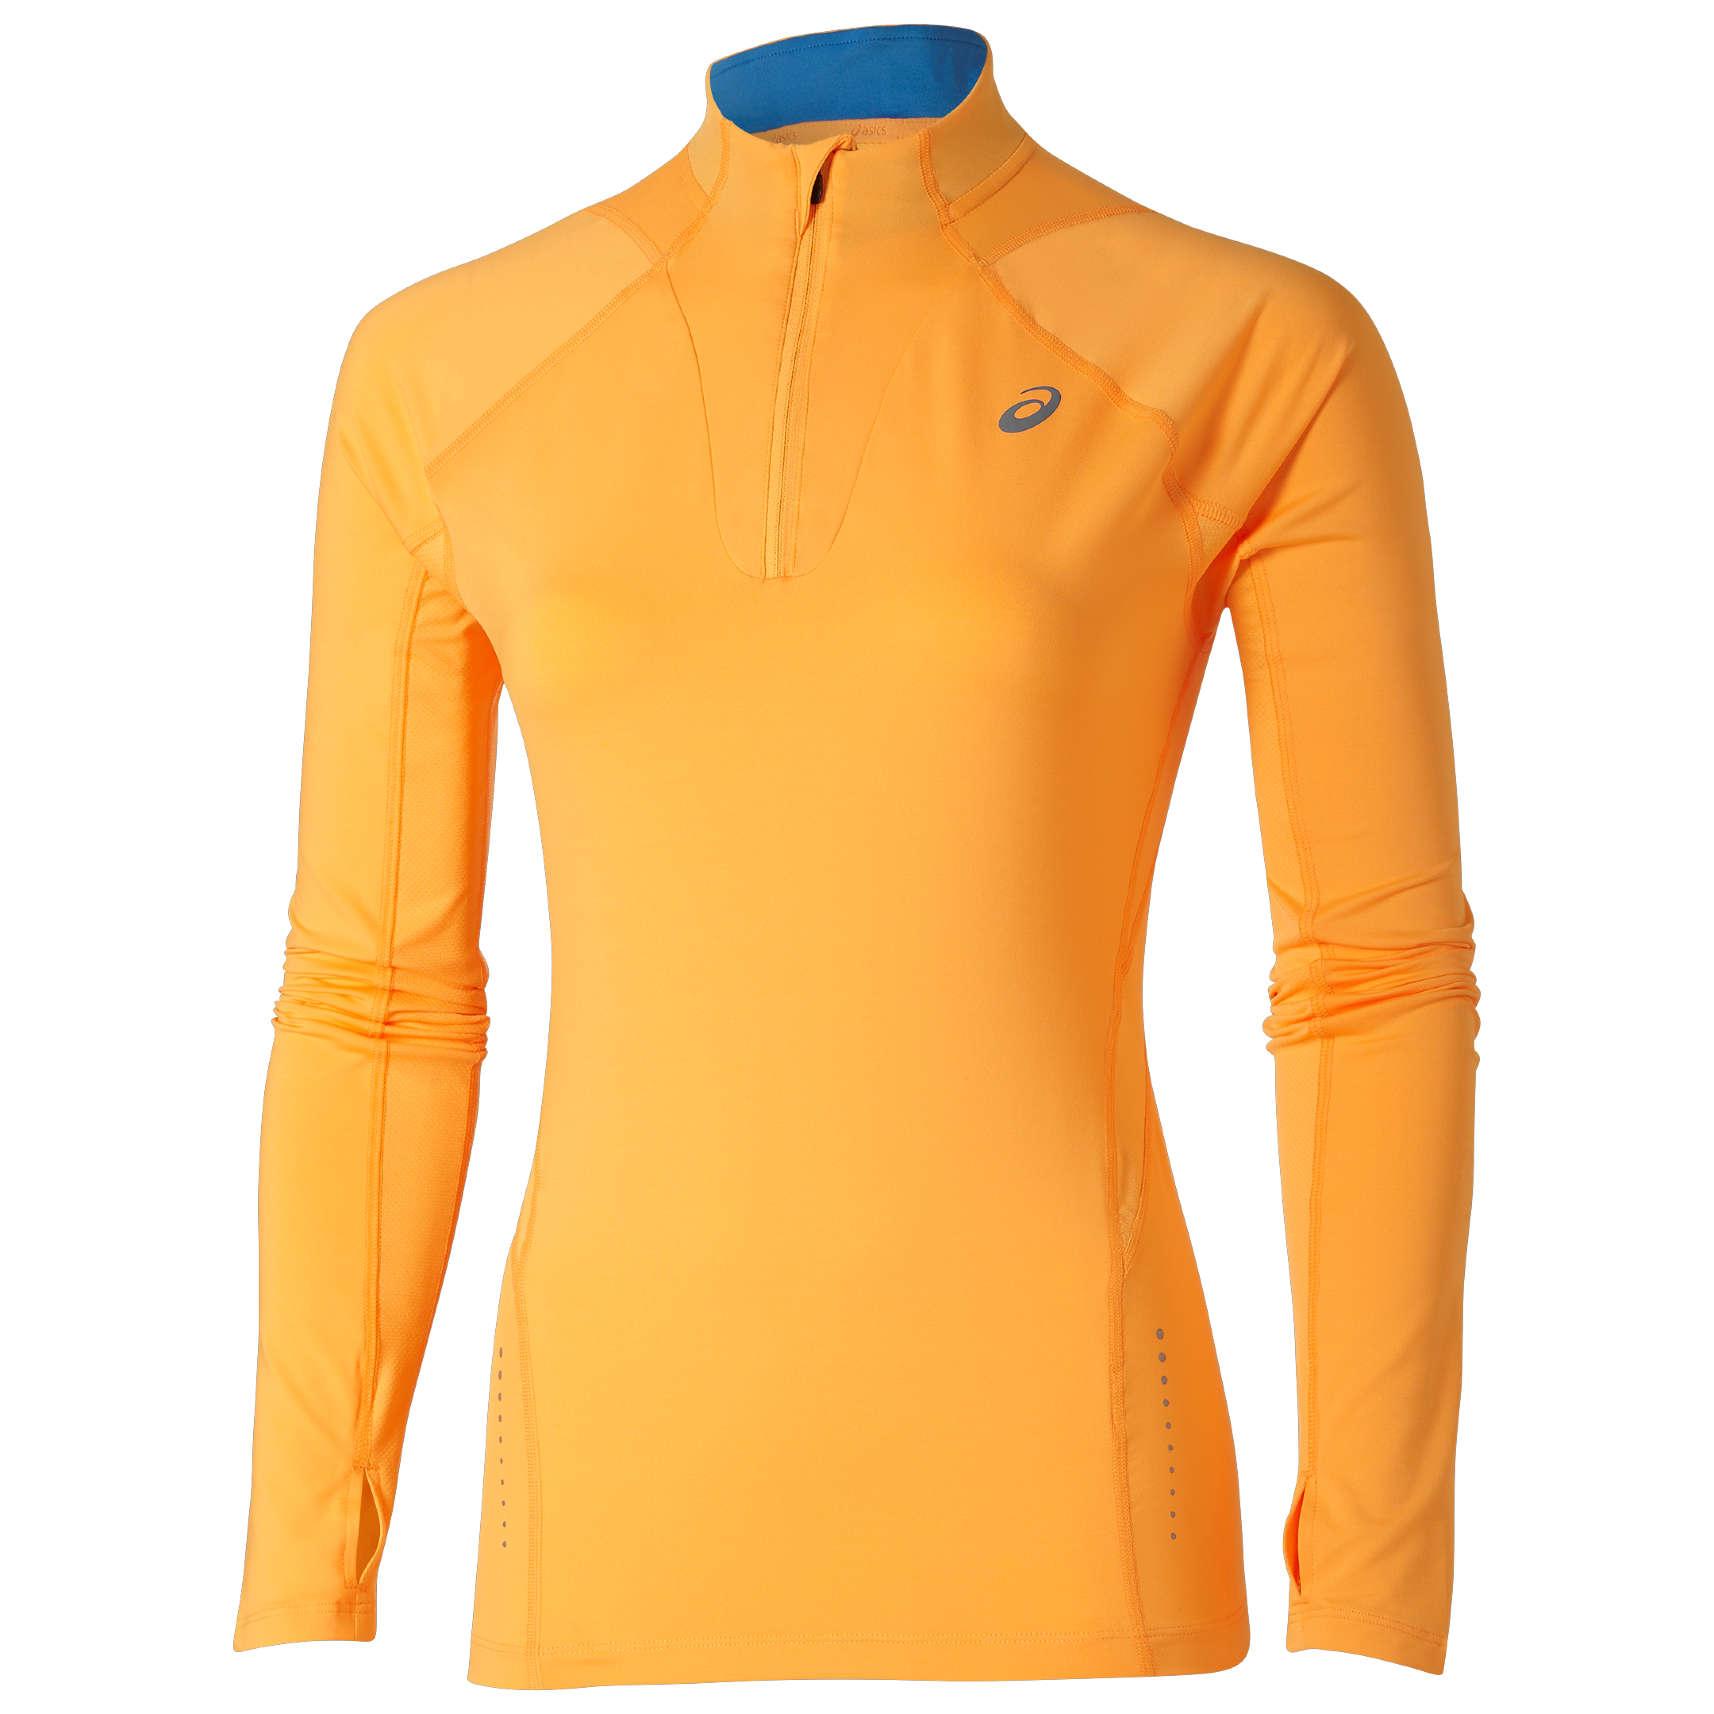 d74c824a76f ASICS 1/2 Zip Shirt Lange Mouwen Oranje Dames koop je bij Futurumshop.nl